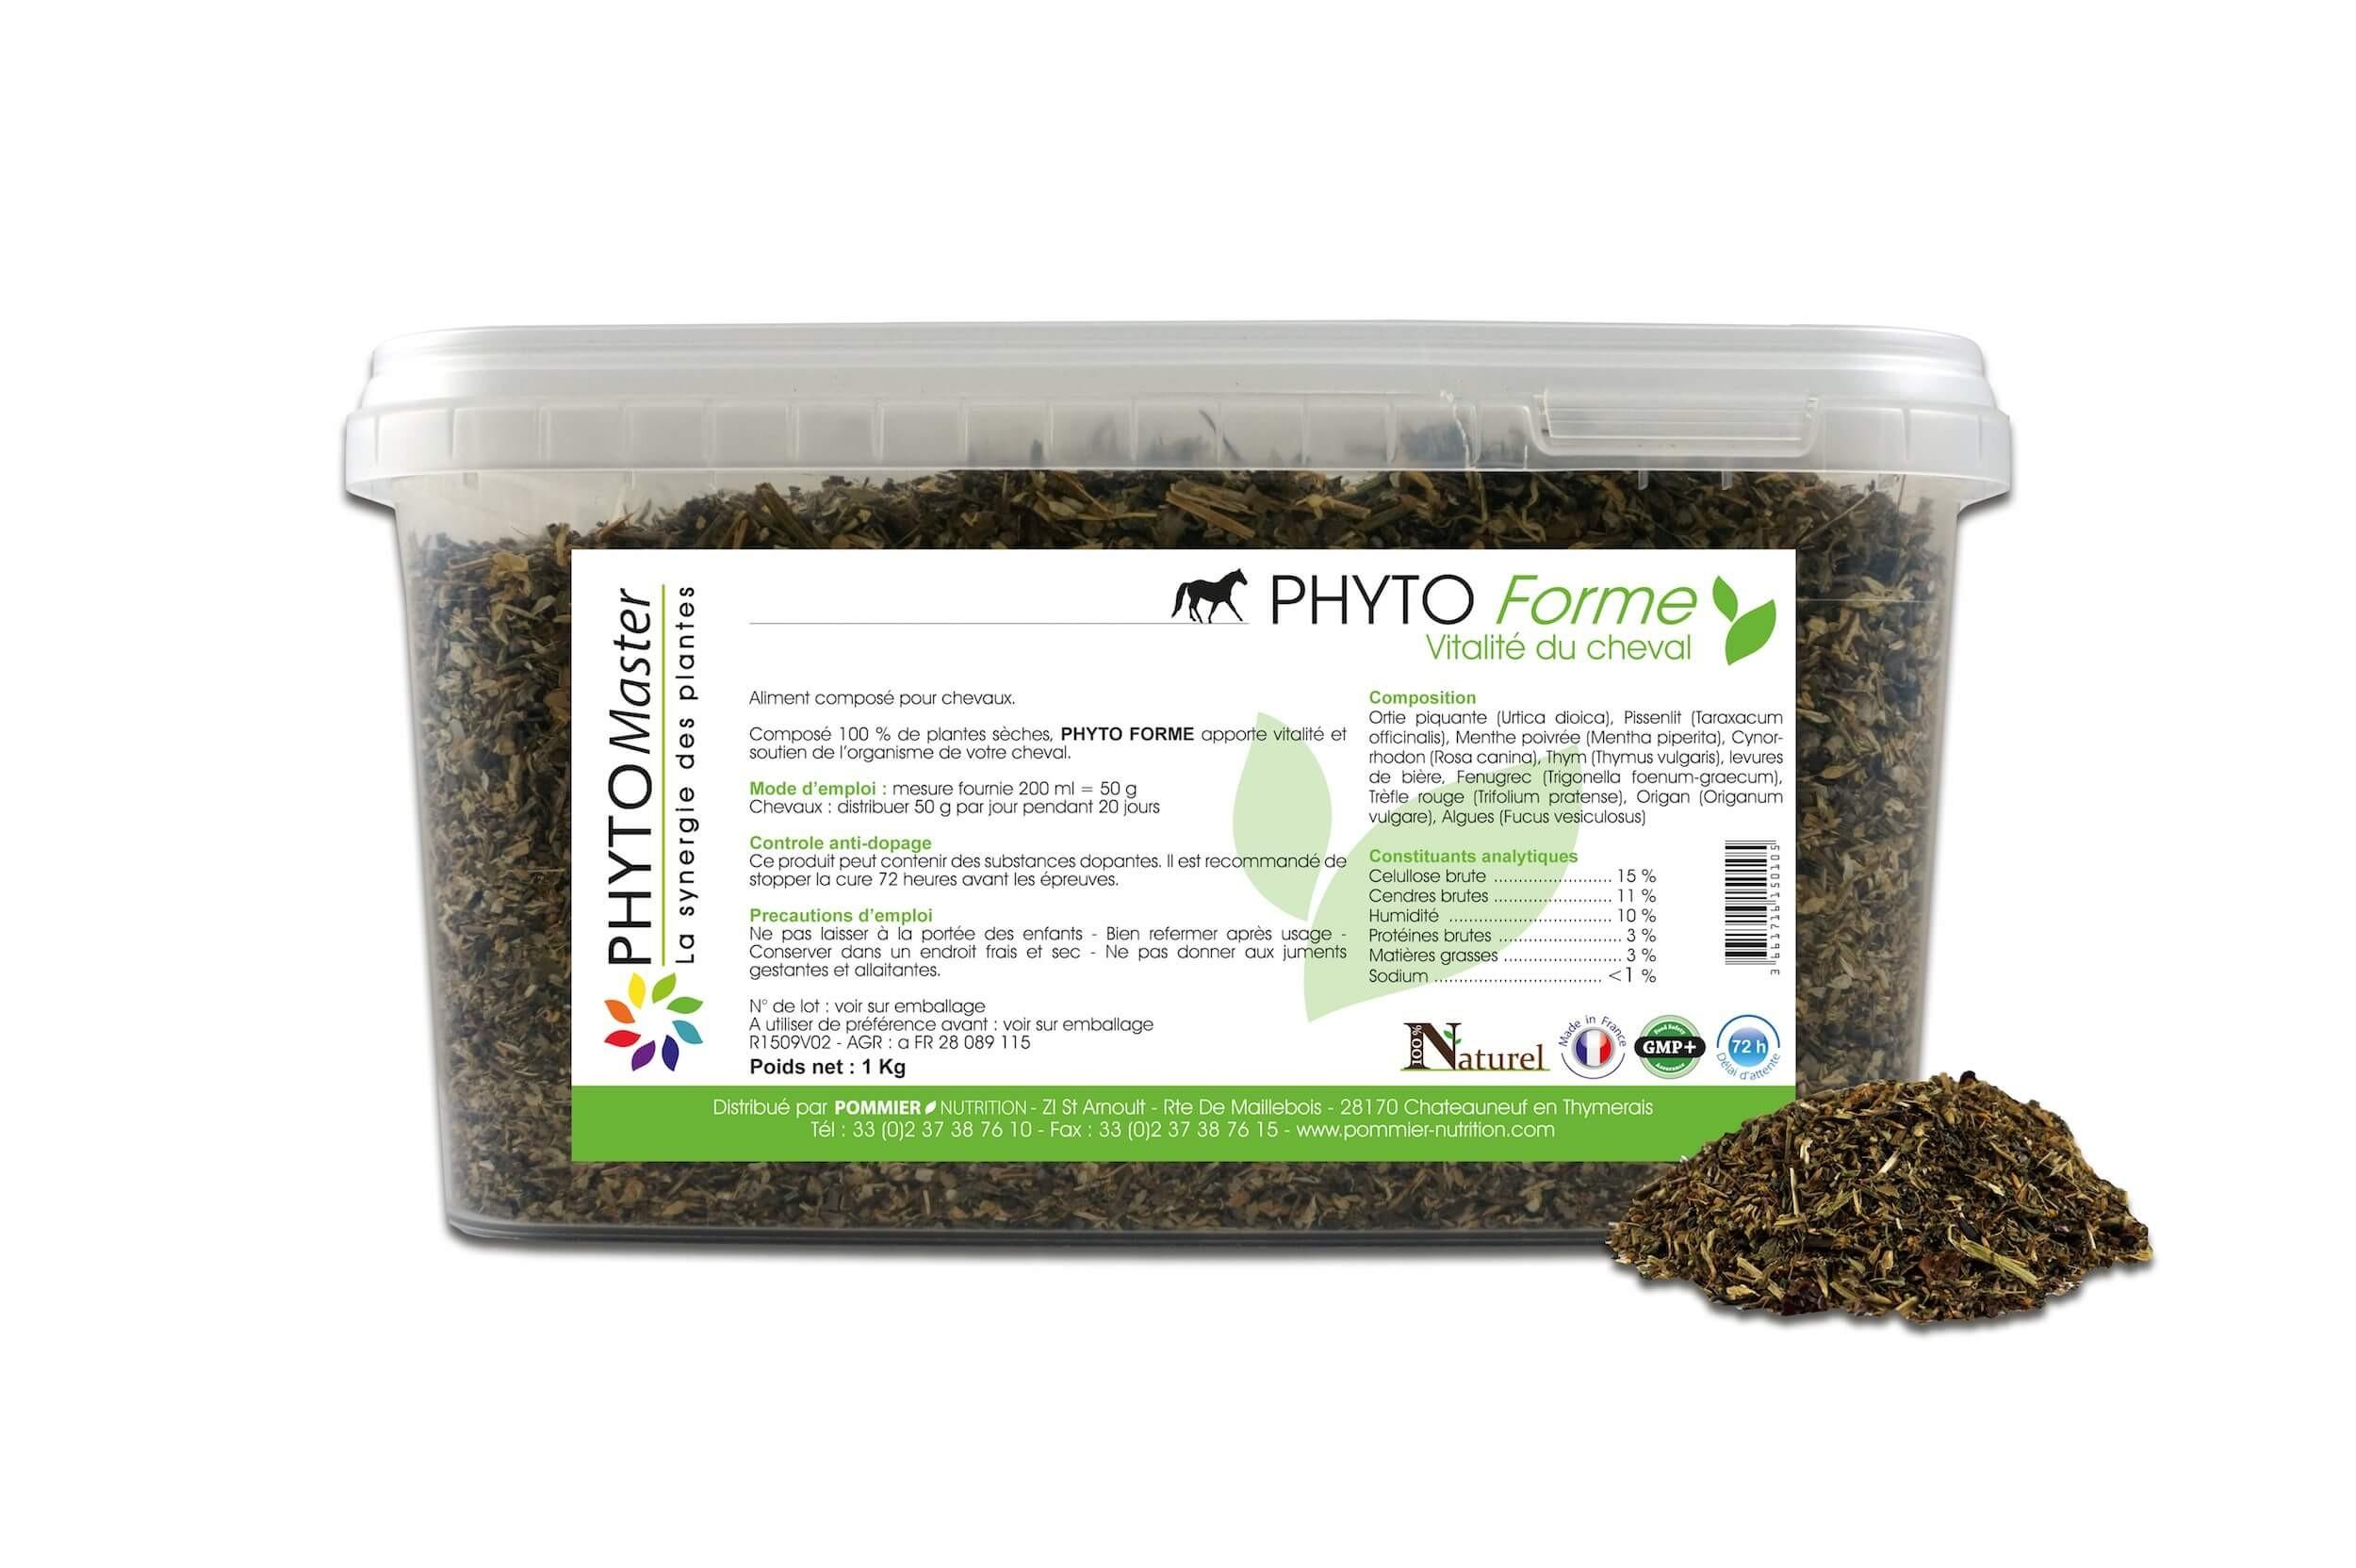 Phyto Master Forme 1 kg - La Compagnie des Animaux